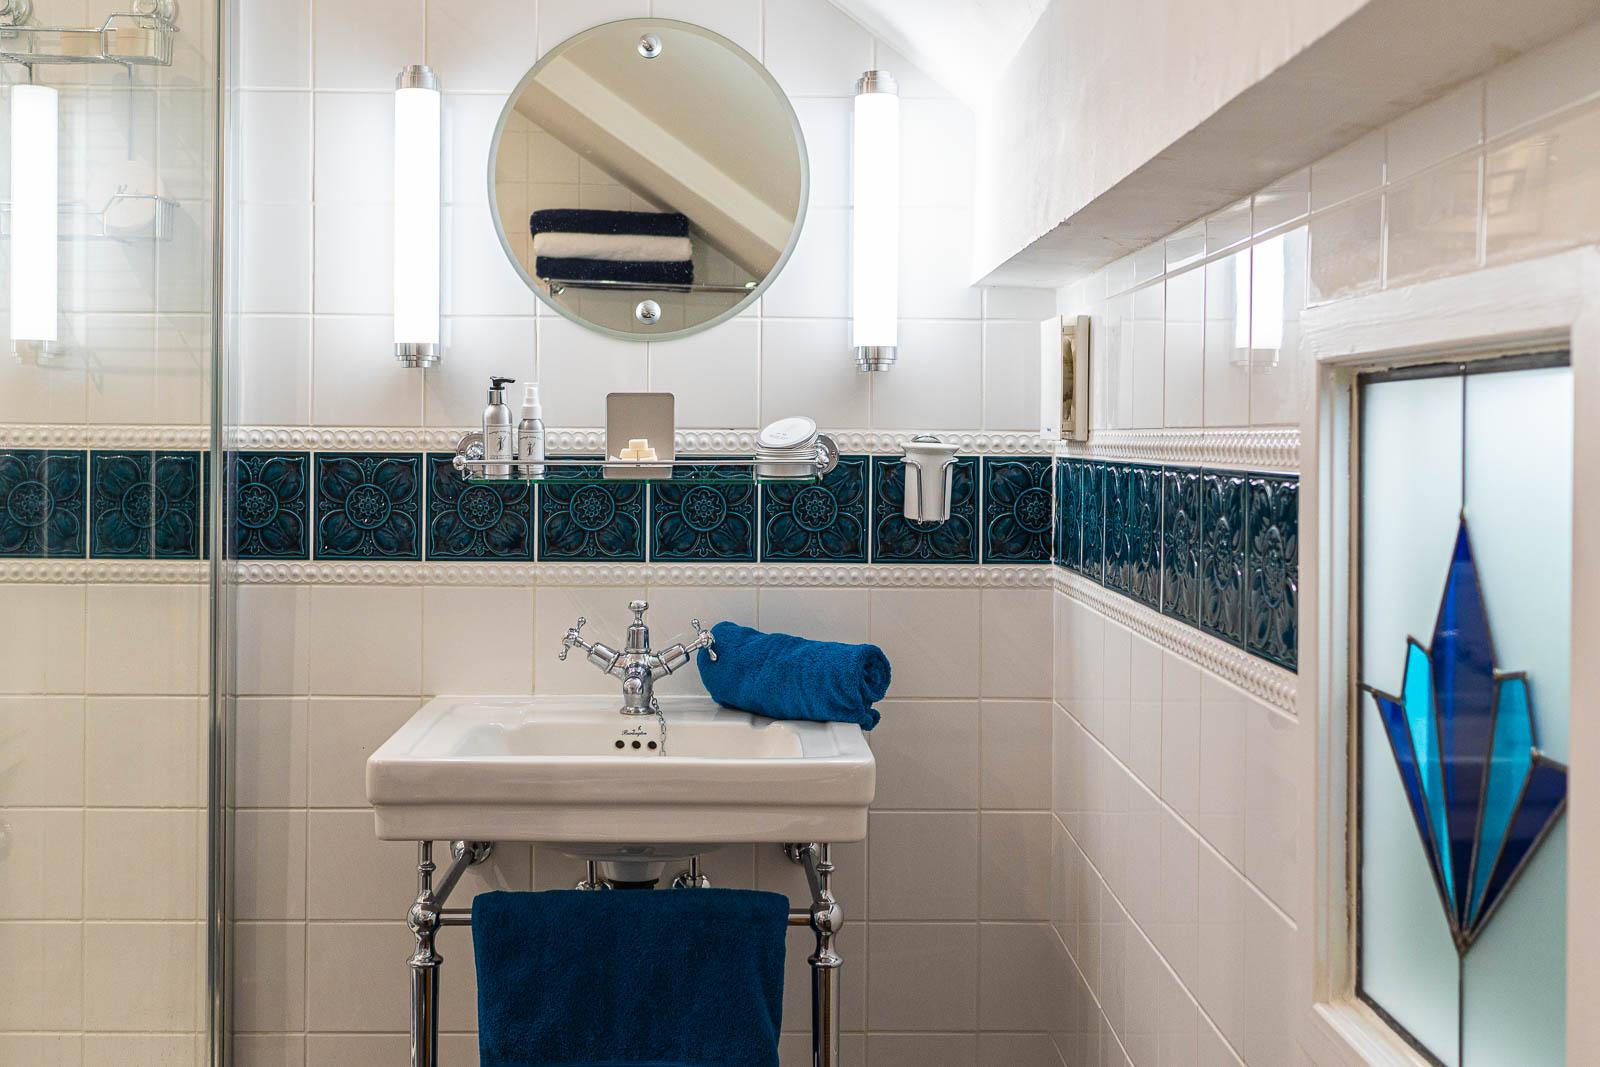 Fammily Bathroom